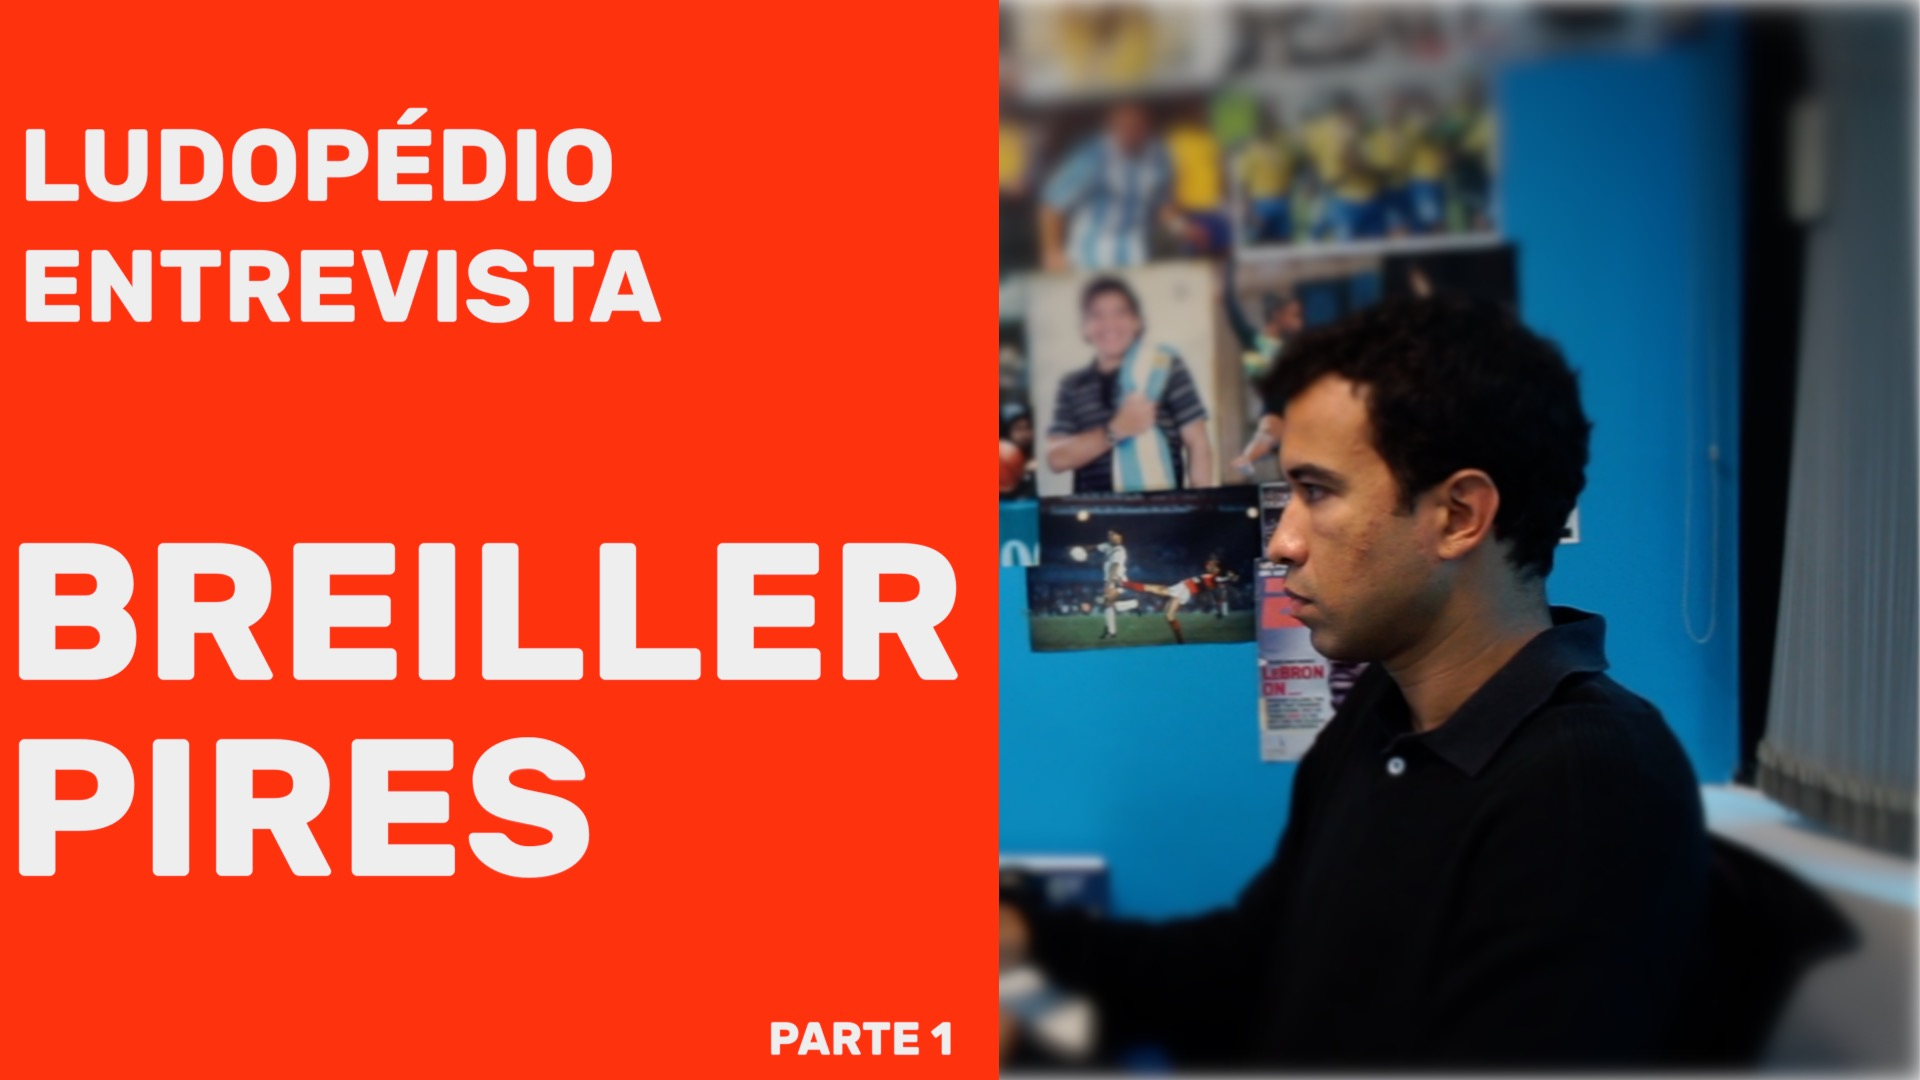 Ludopédio Entrevista Breiller Pires – Parte 1